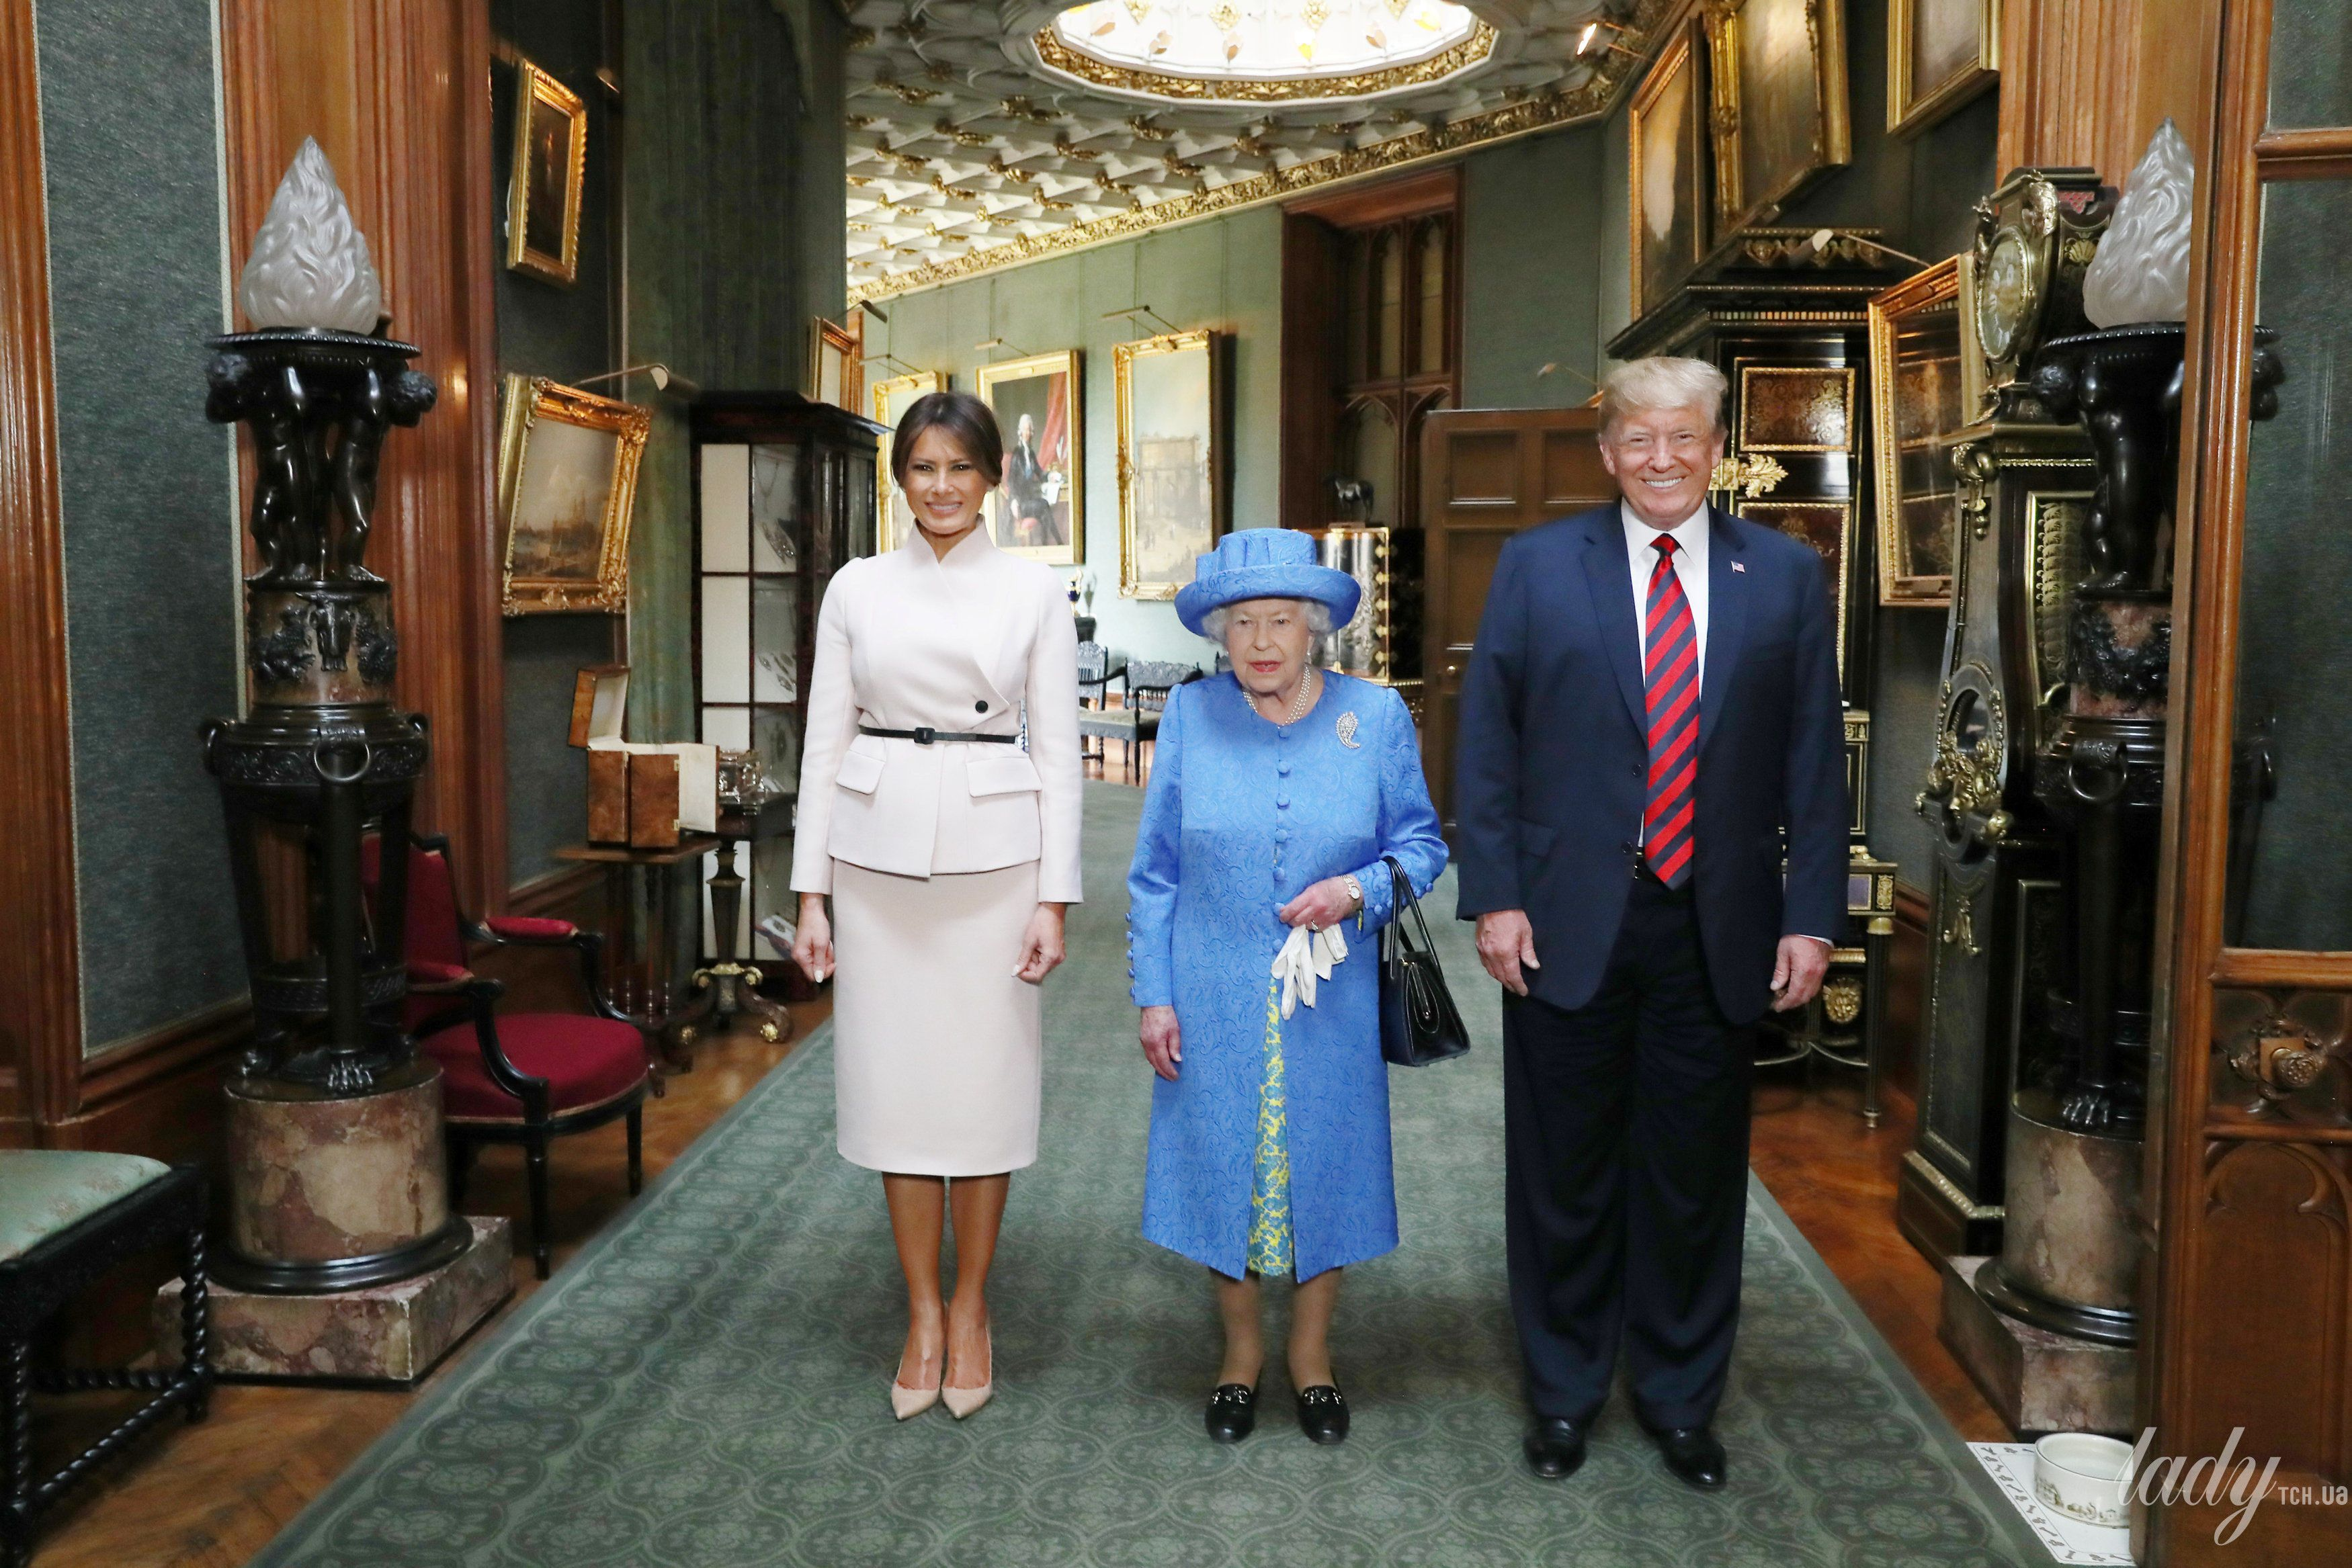 Королева Елизавета II, Мелания Трамп и Дональд Трамп_5